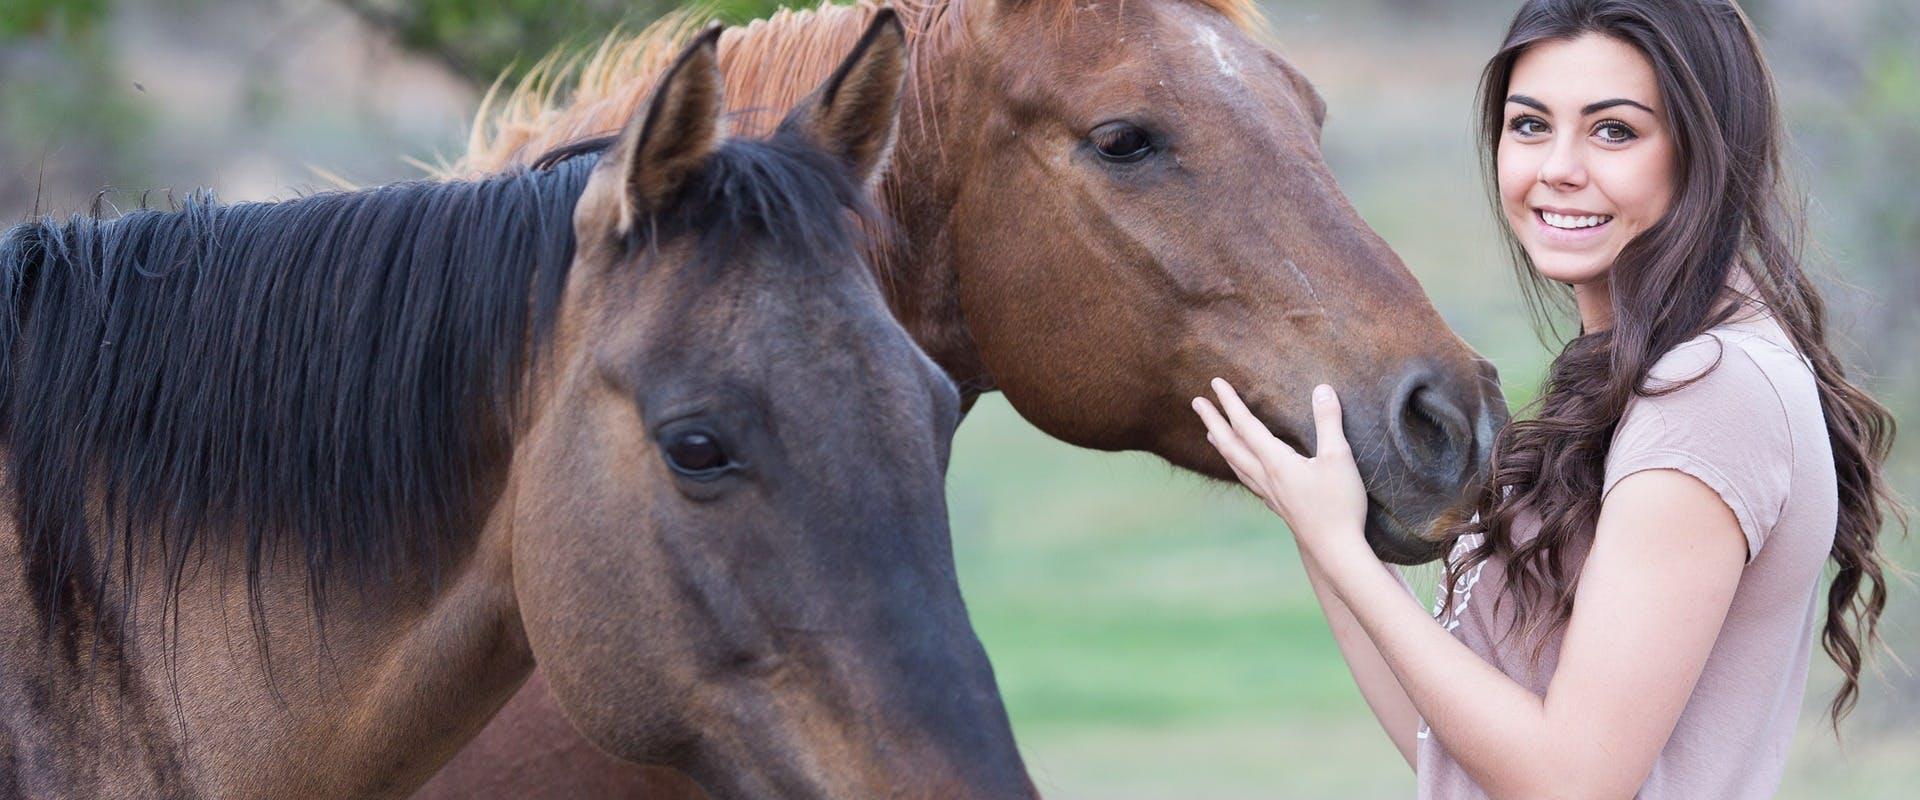 1541693775 horses 19962851920